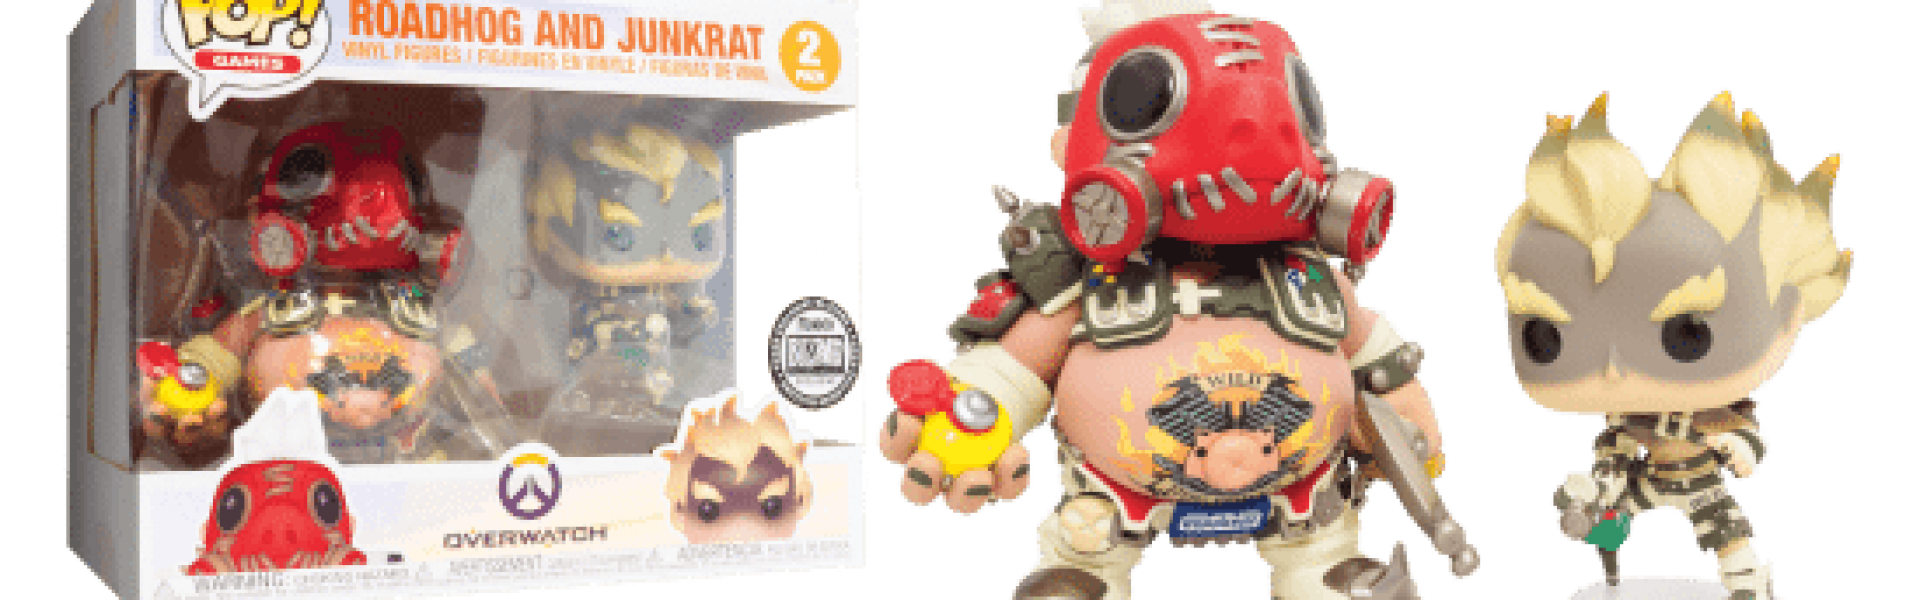 ow-funko-roadhog-junkrat-2pack-box-gallery